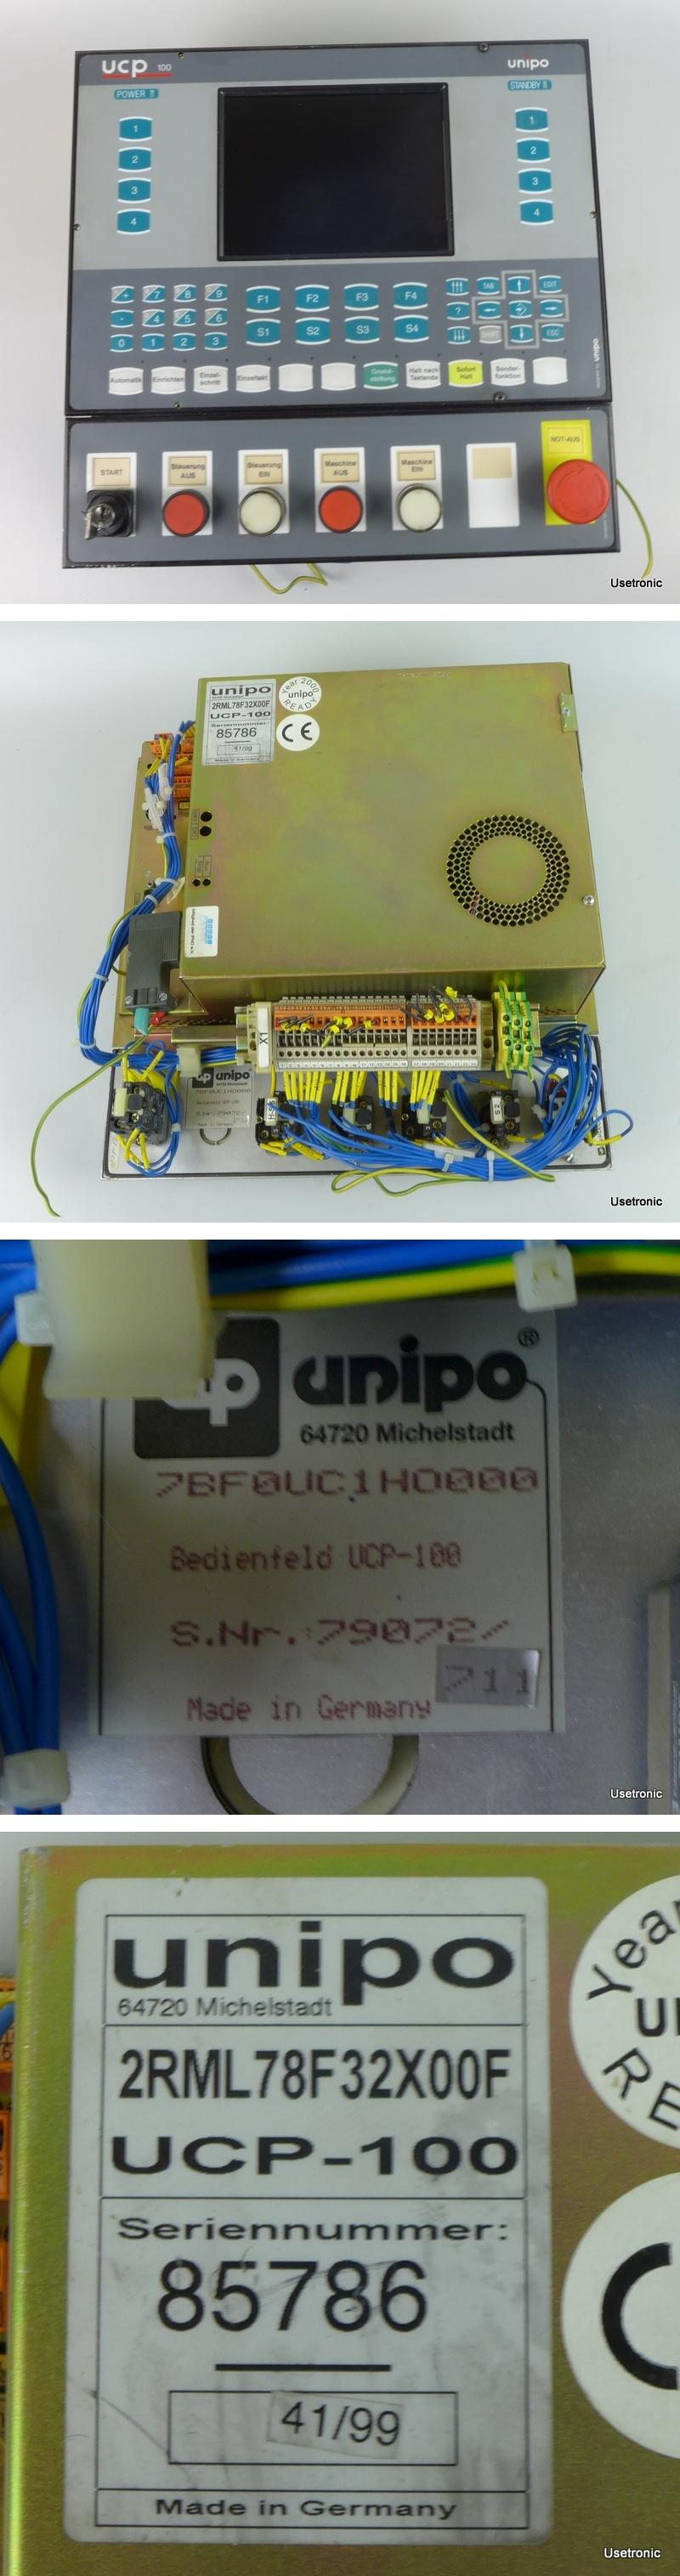 Unipo Panel UCP-100 2RML78F32X00F 7BF0UC1HO000